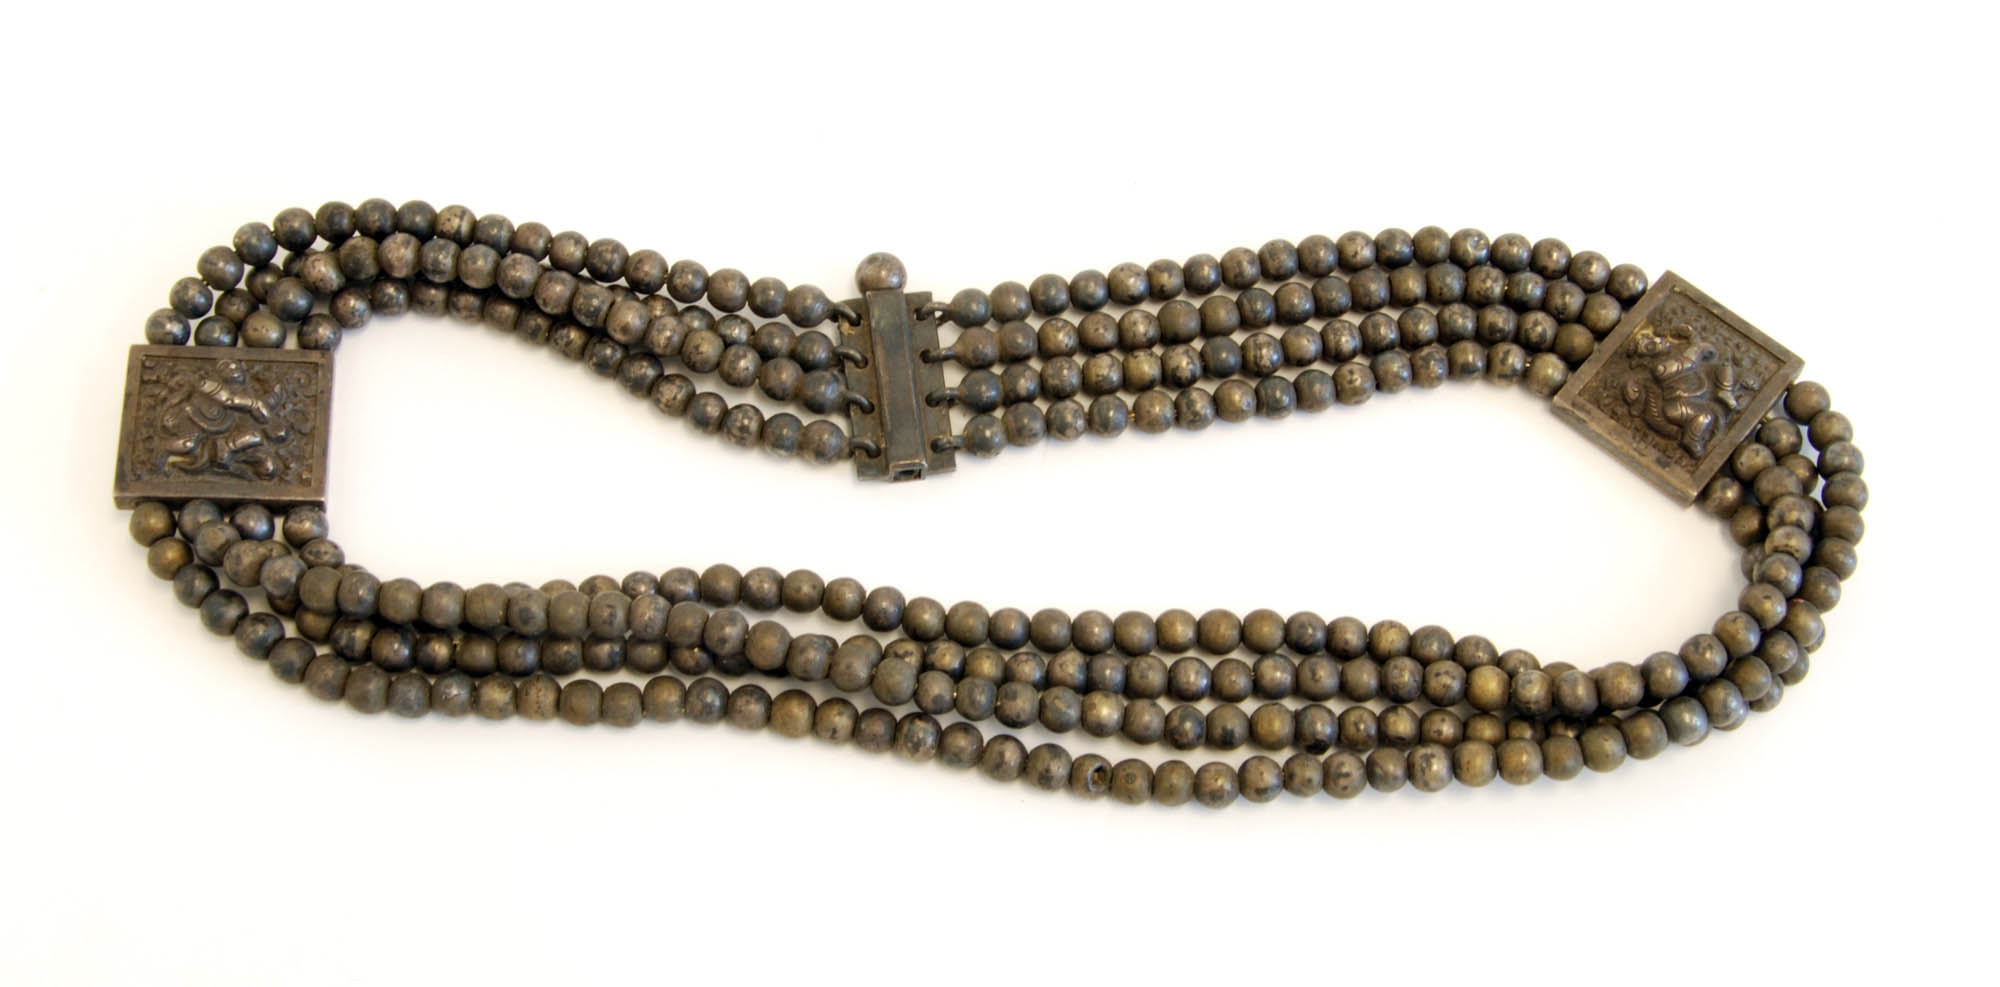 Strand of beads